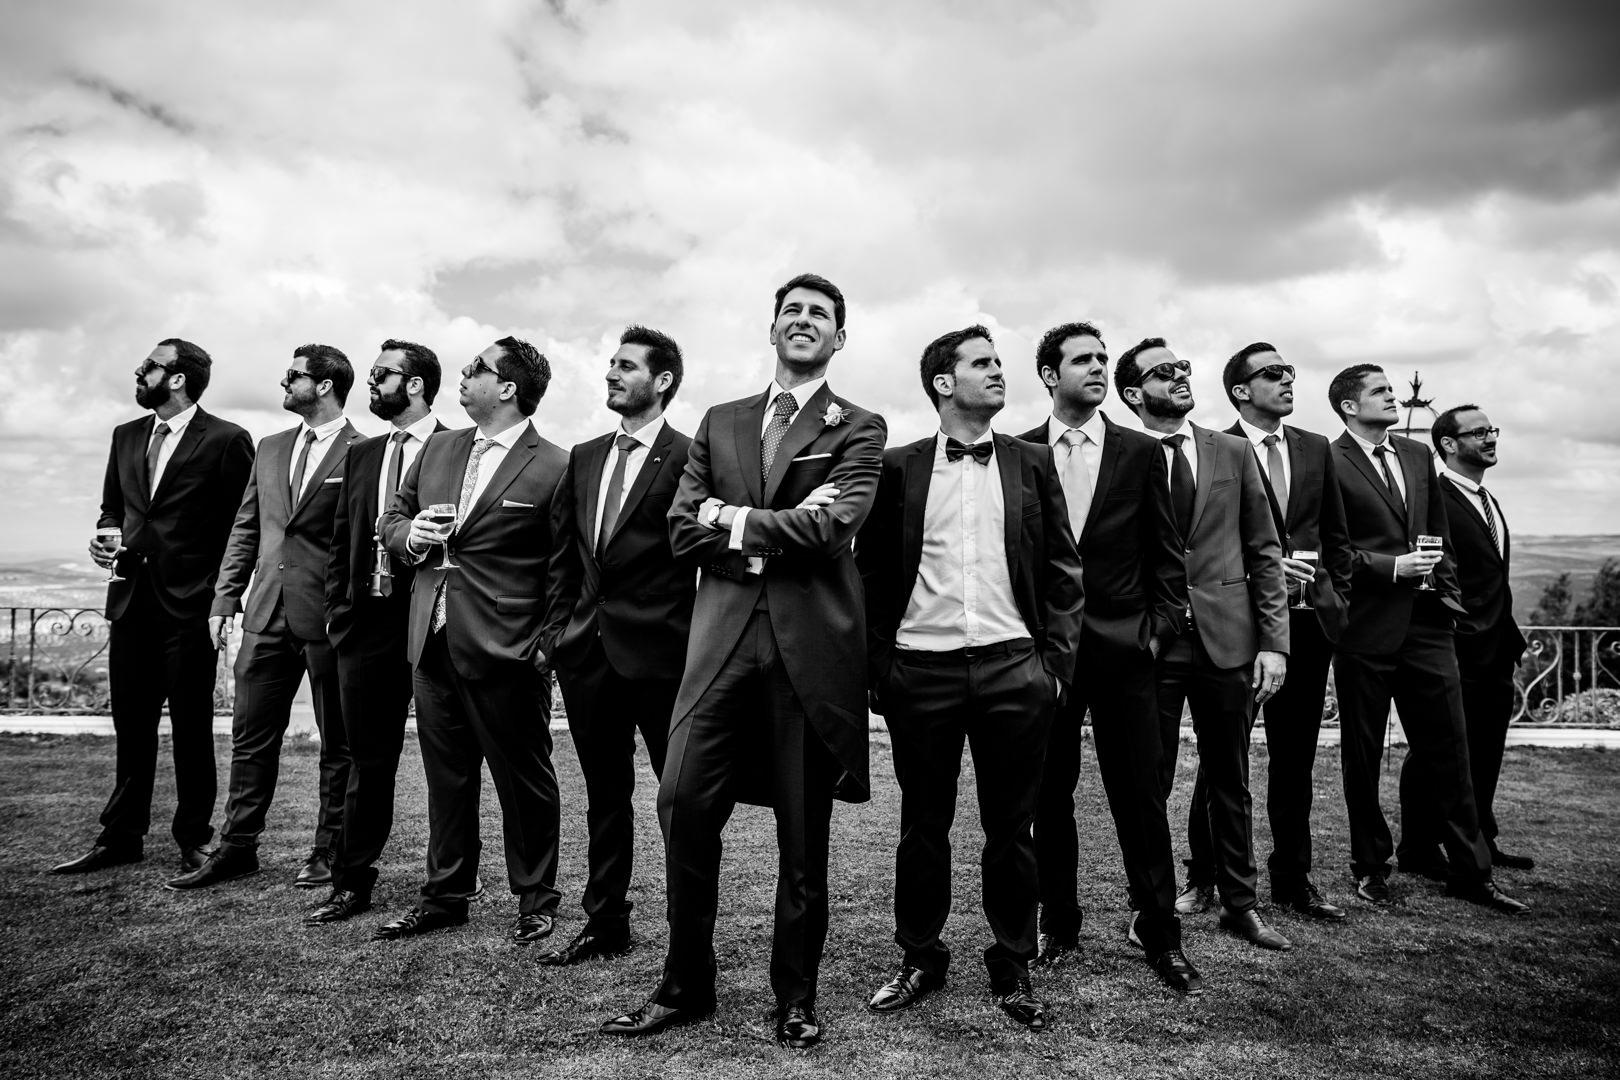 Boda-Catedral-Jaen-Hamburgo-Maria-David-engagement-Rafael-Torres-fotografo-bodas-sevilla-madrid-barcelona-wedding-photographer--36.jpg